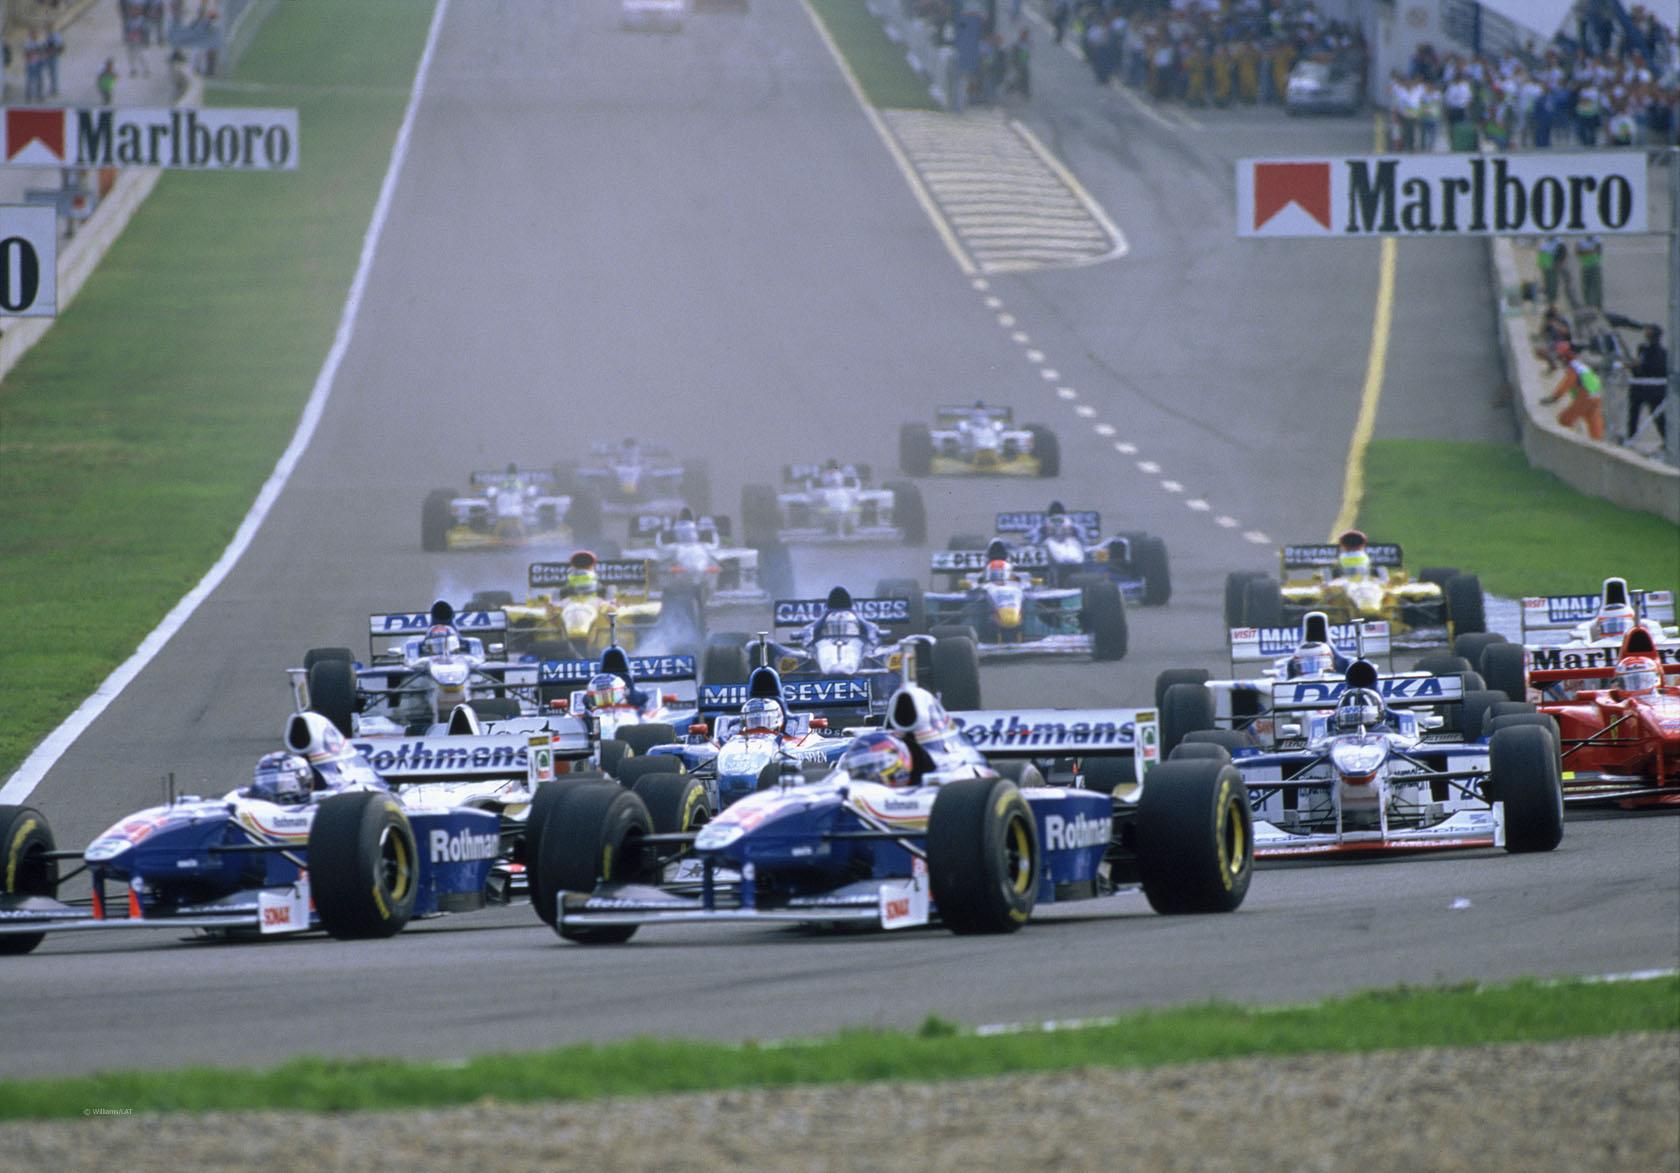 1997 European Grand Prix start